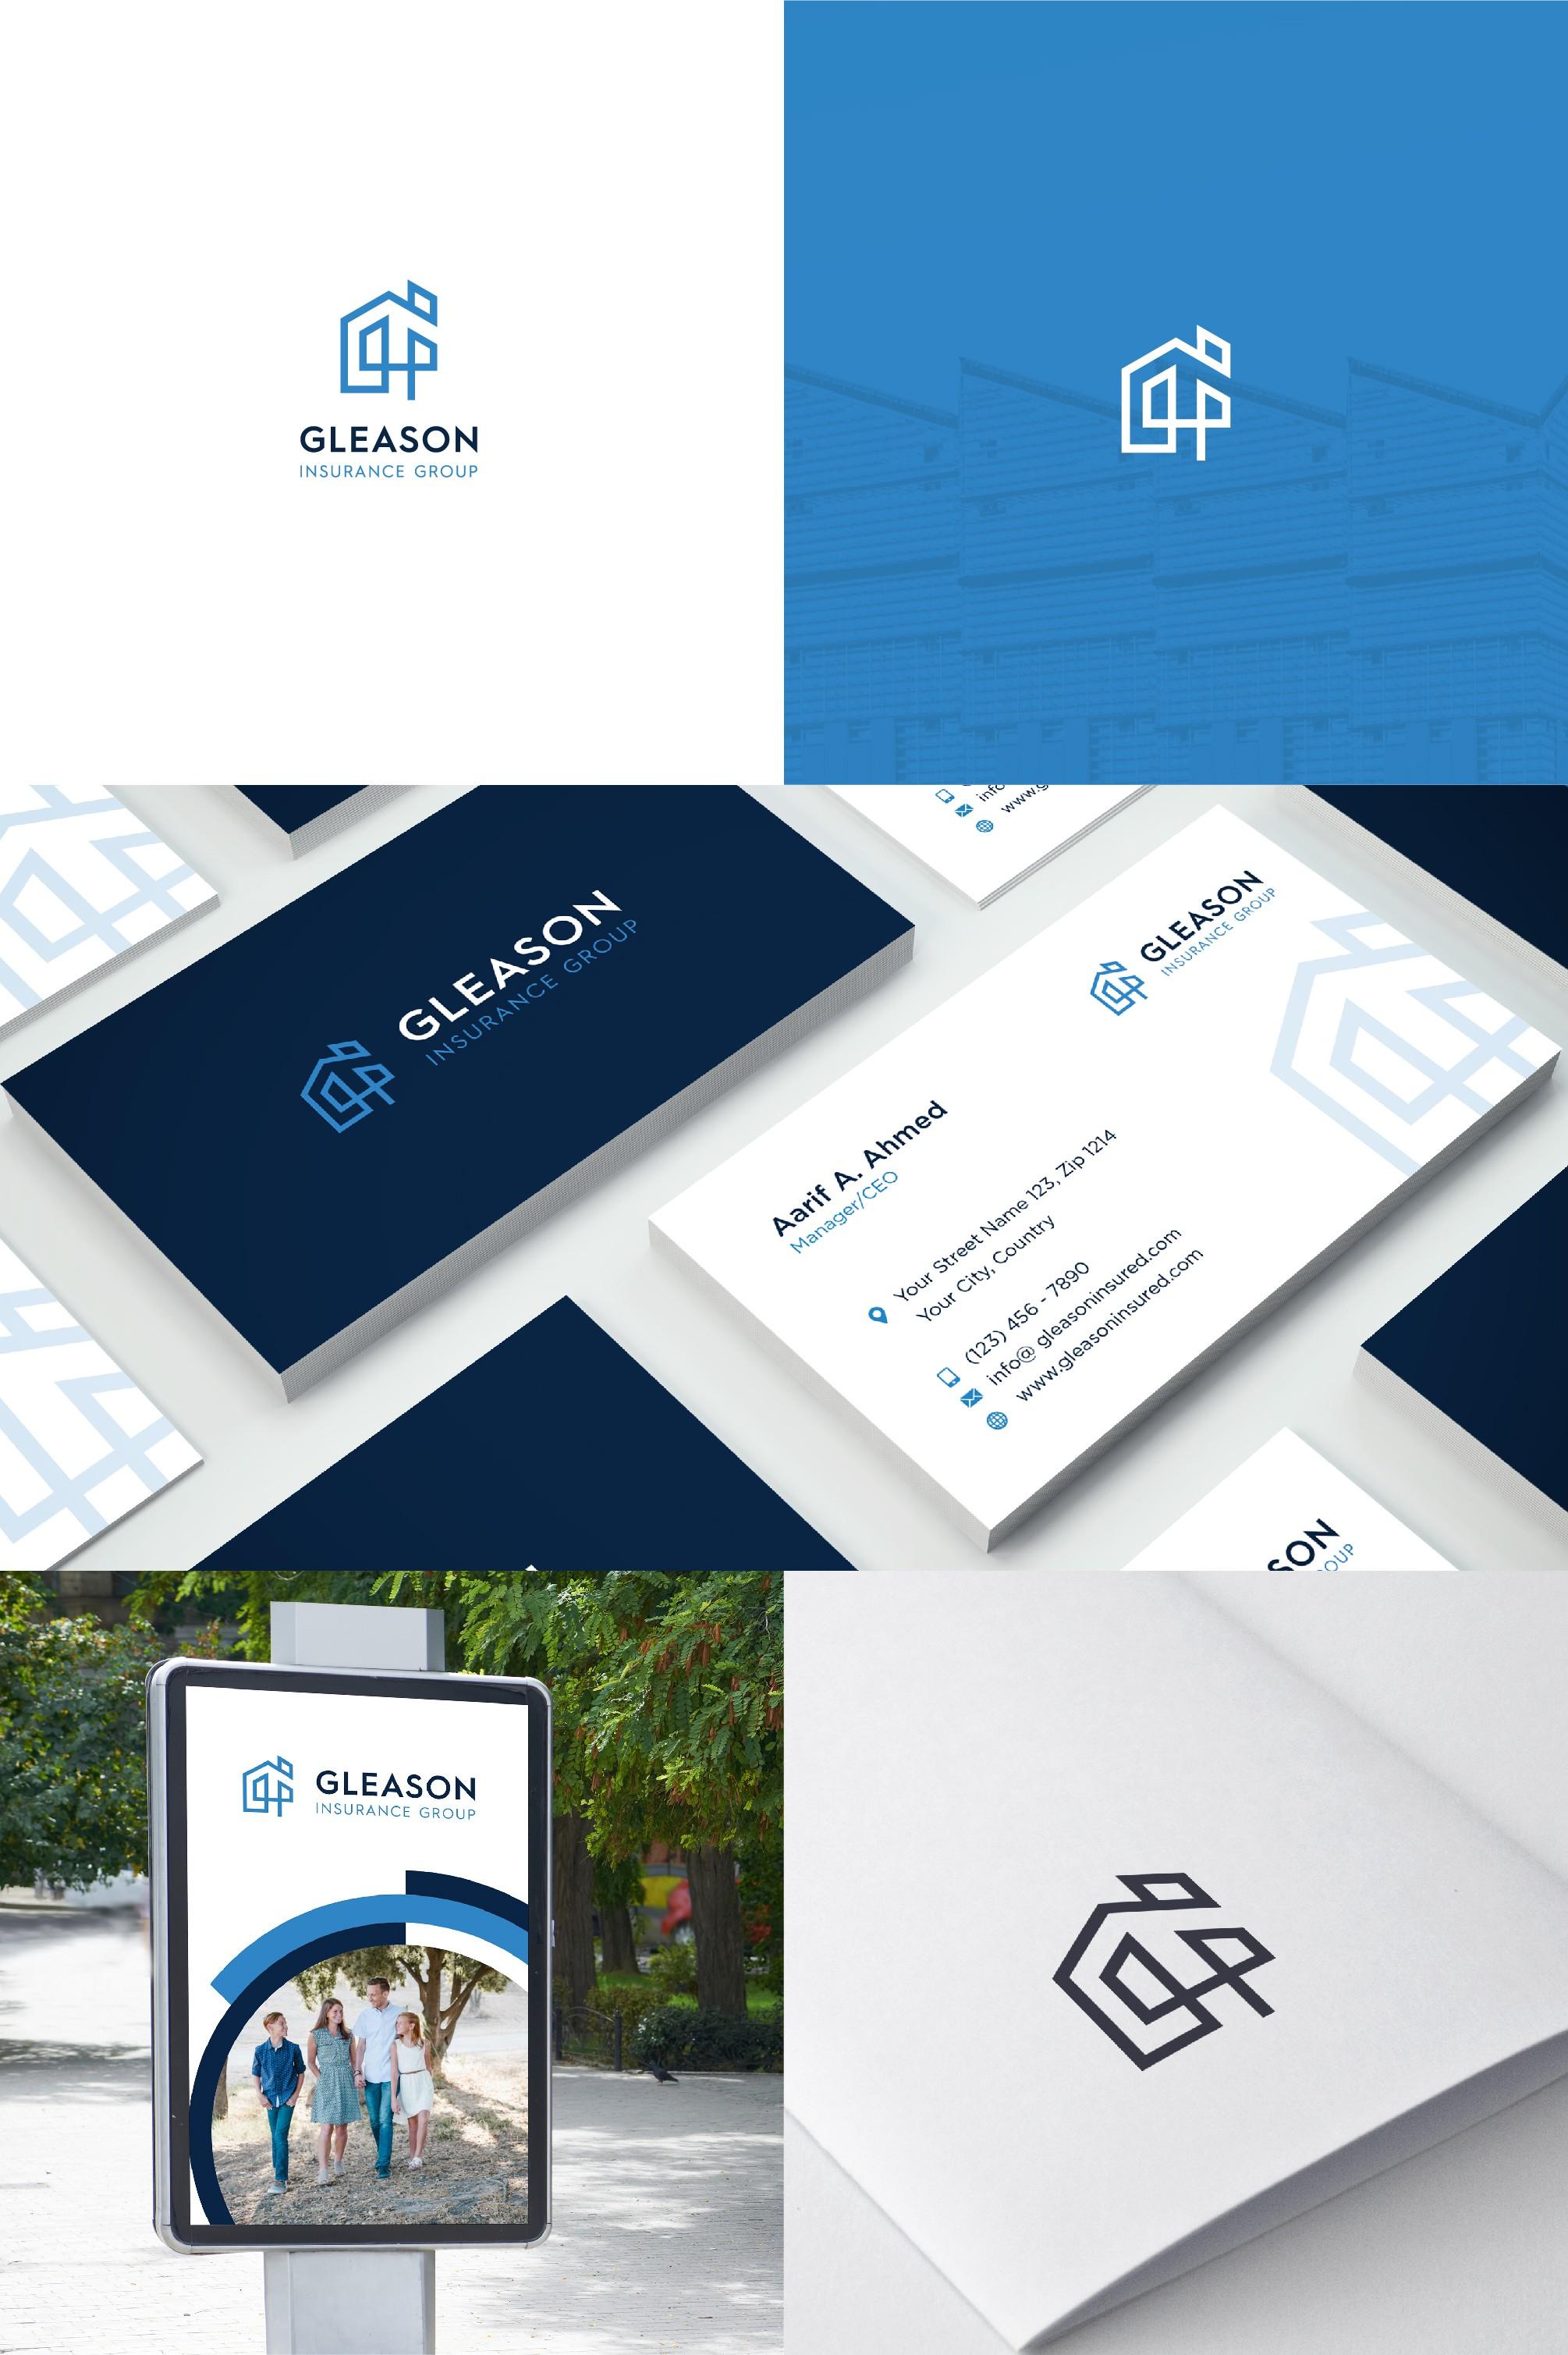 Gleason Insurance Group